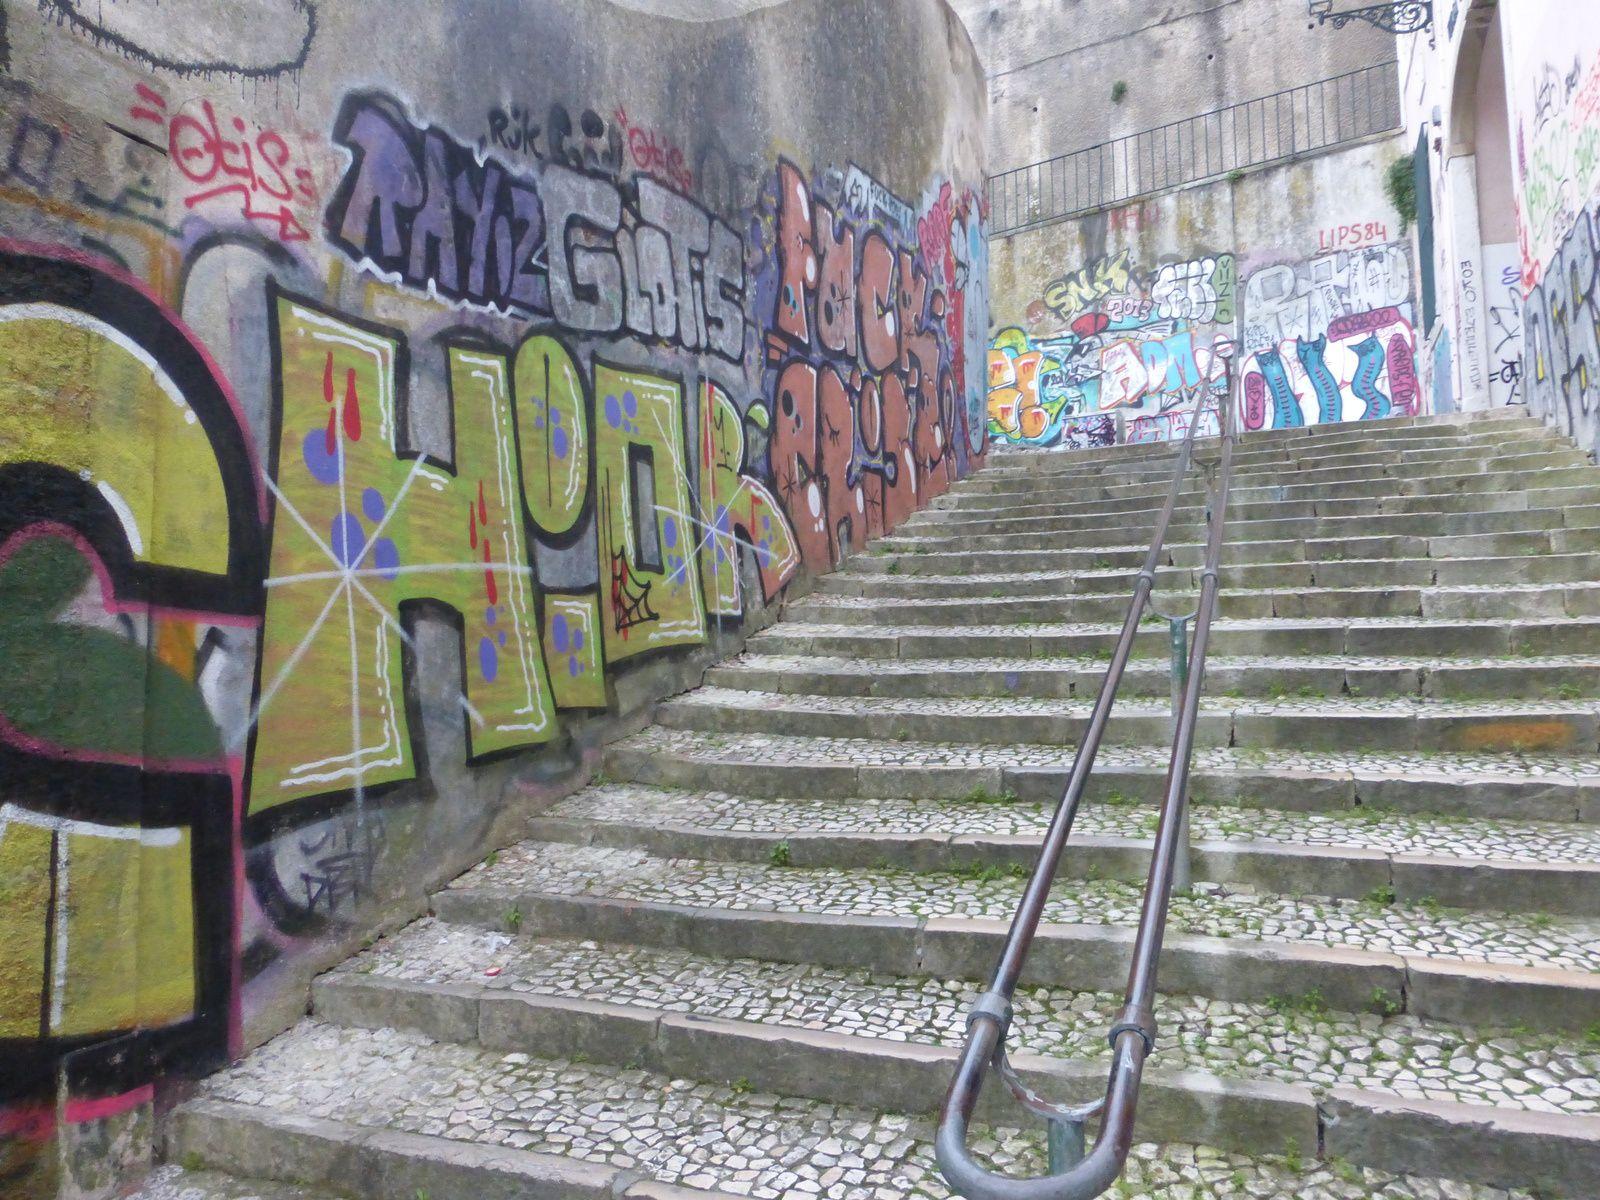 Lisbonne #3 l'art urbain